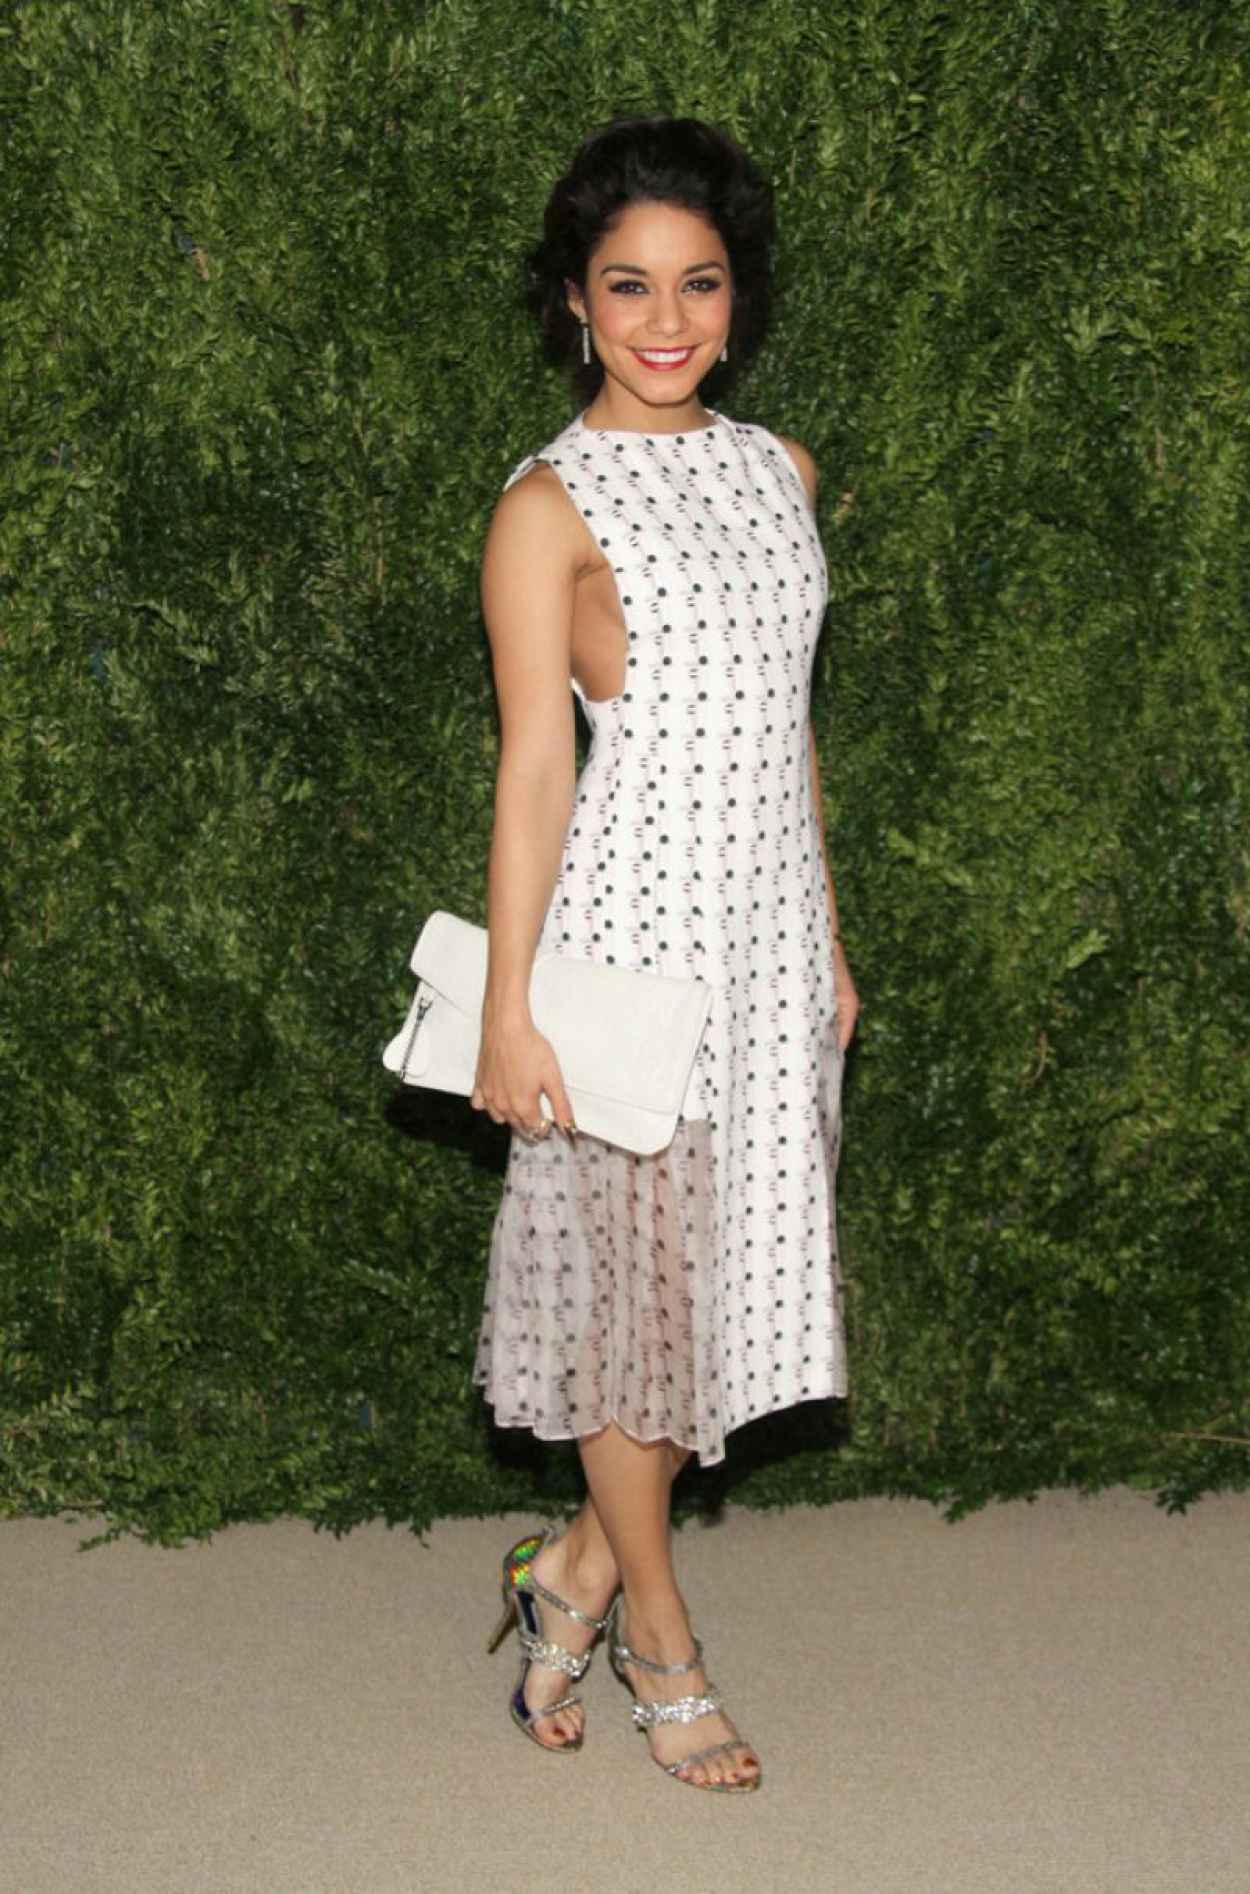 Vanessa Hudgens Attends CFDA & Vogue Fund Reception in New York City-1